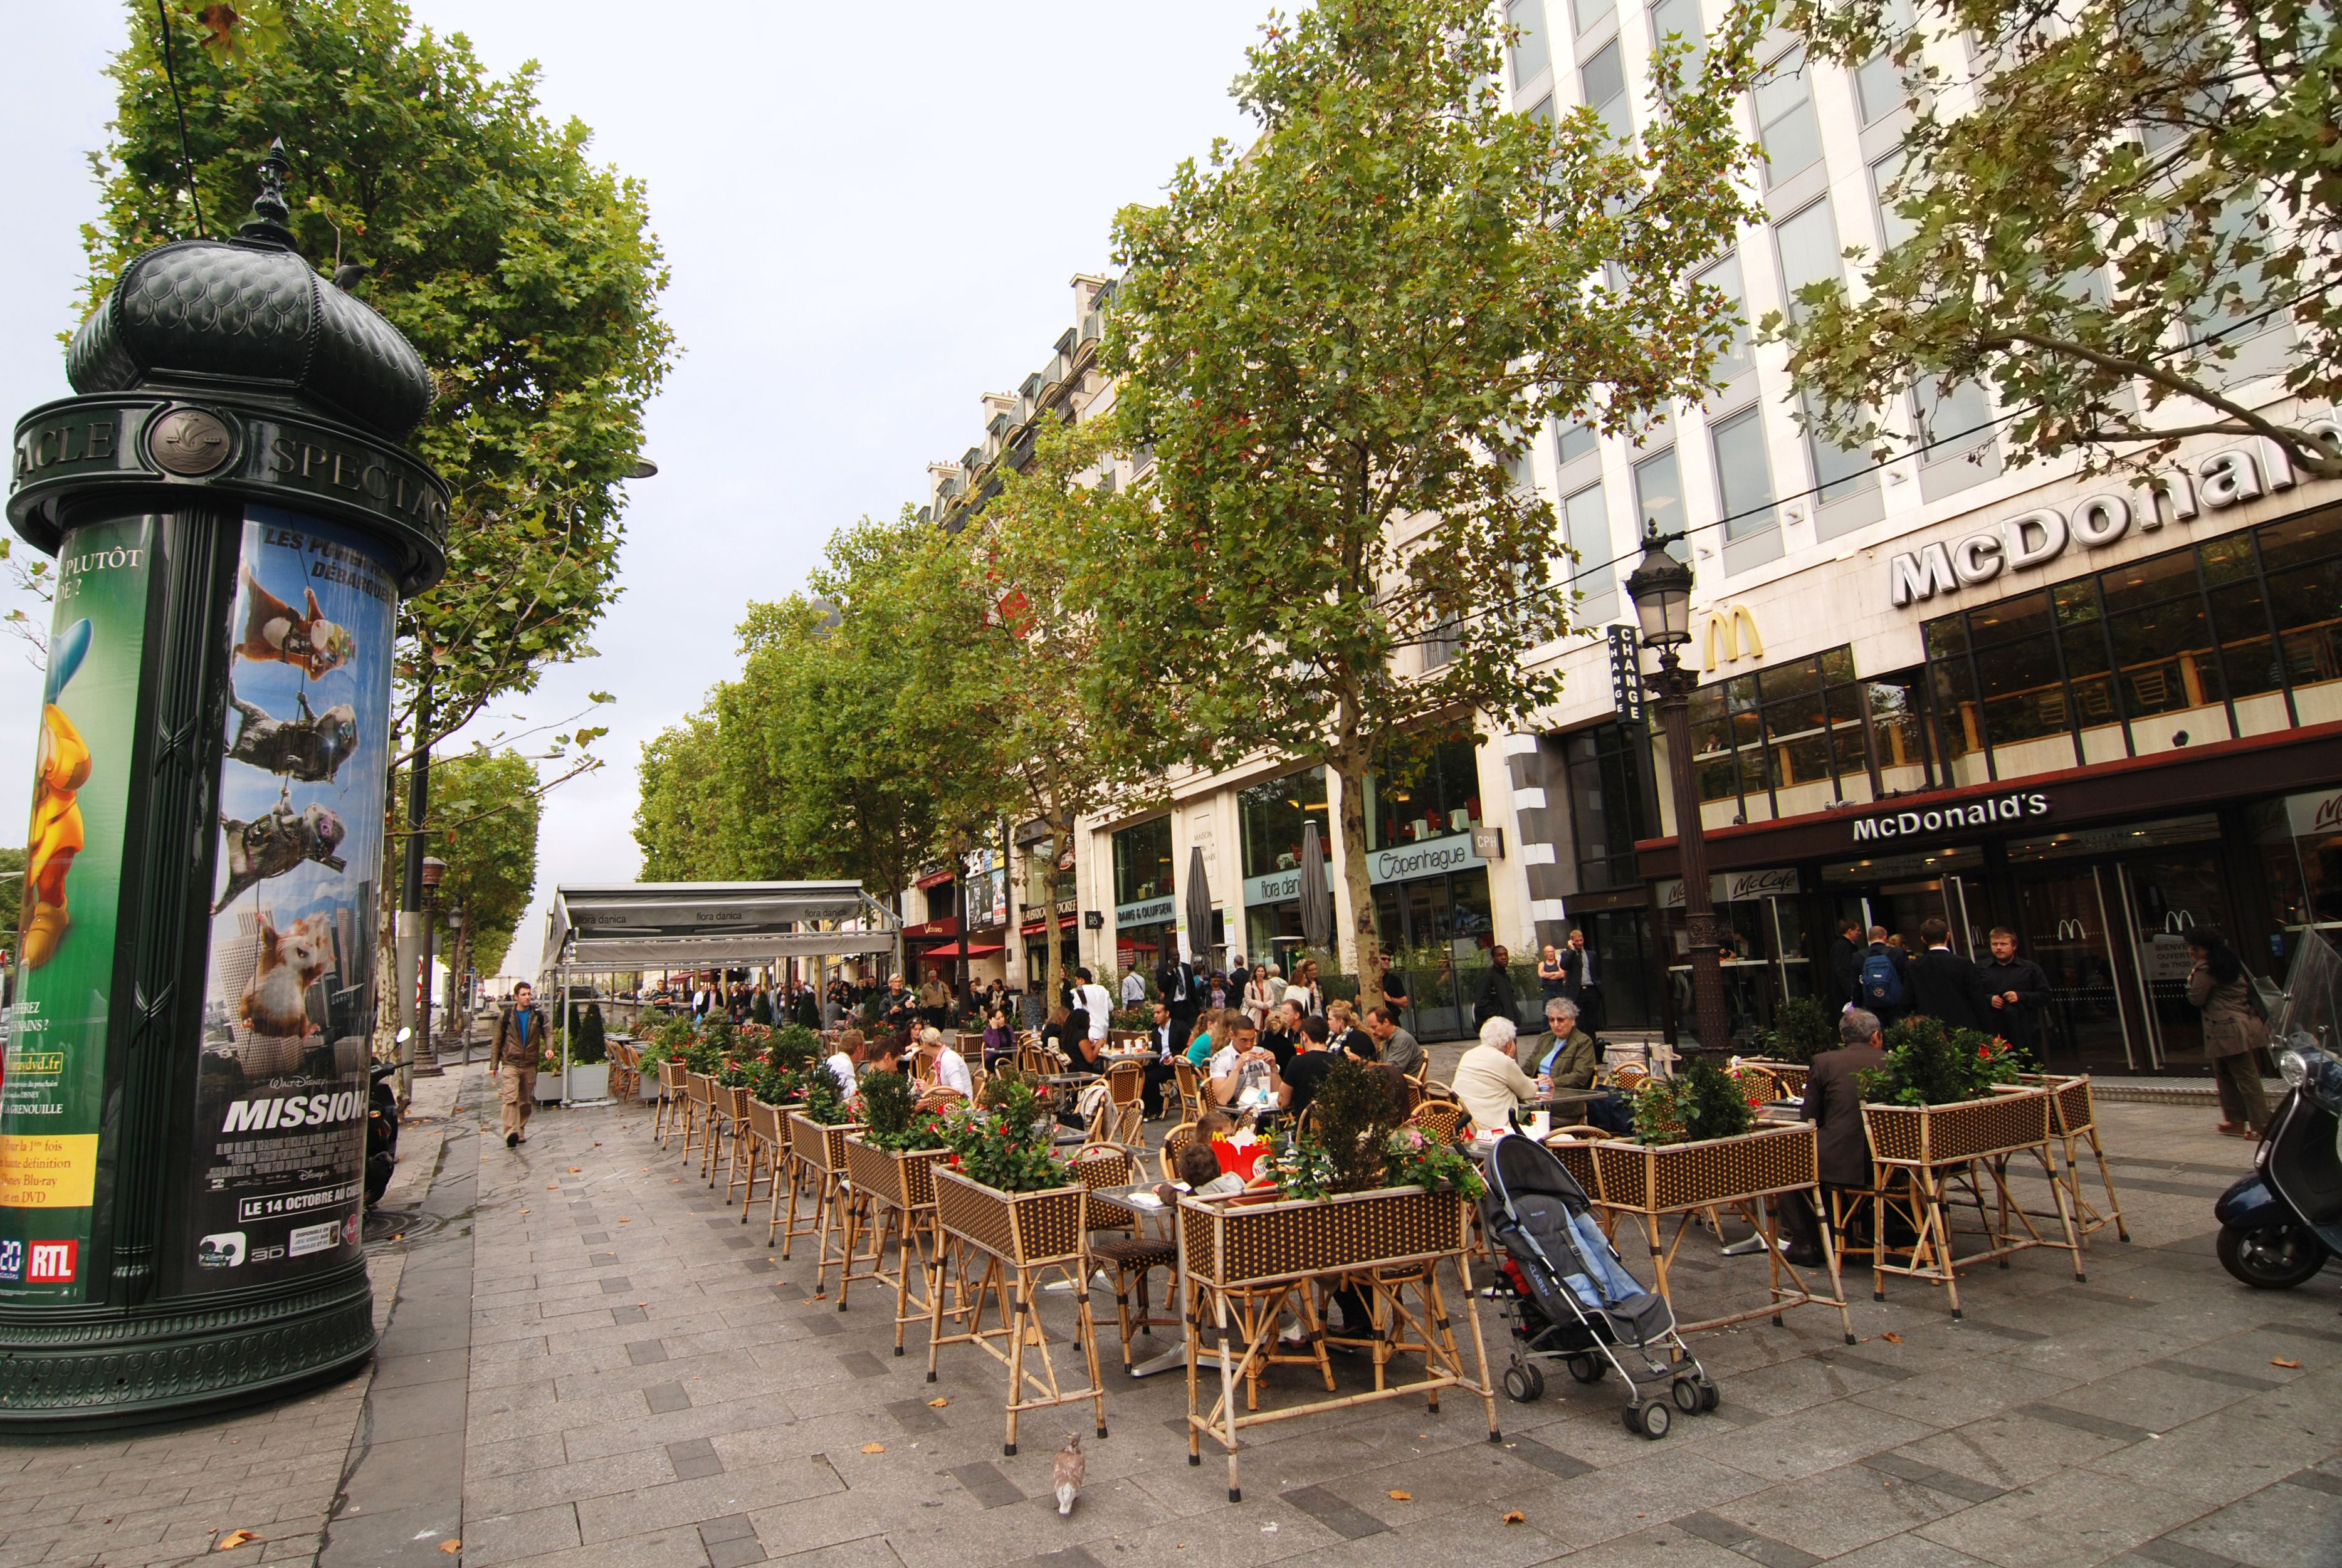 McDonalds on Champs Elysees in Paris